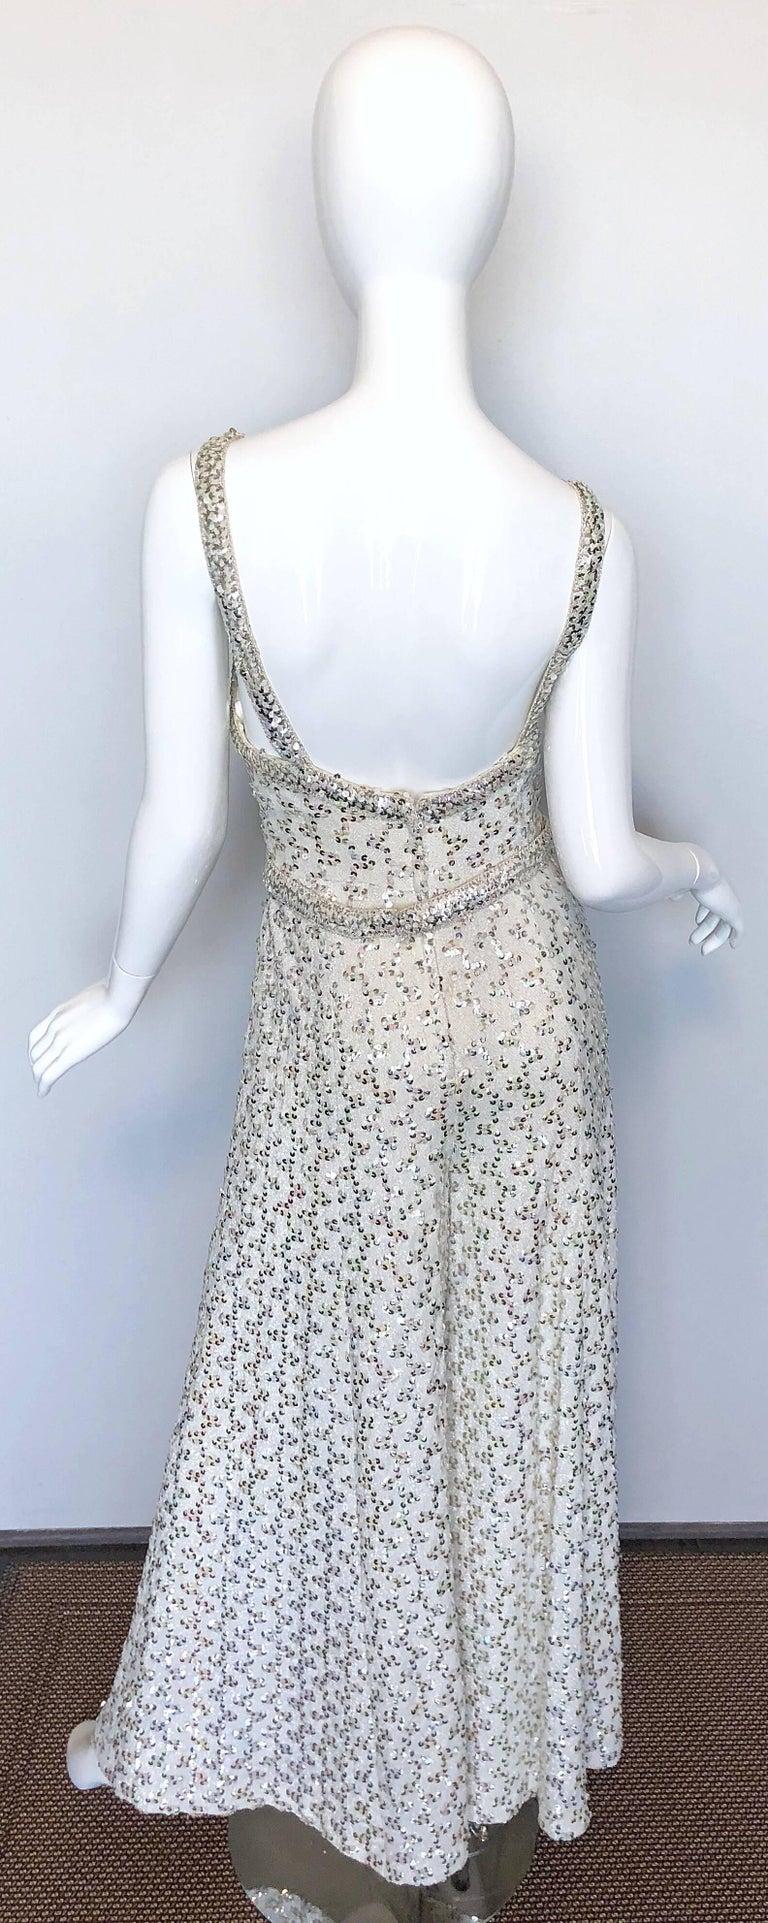 Vintage Lilli Diamond 1970s Silver Sequined 70s Amazing Lurex Wide Leg Jumpsuit For Sale 1